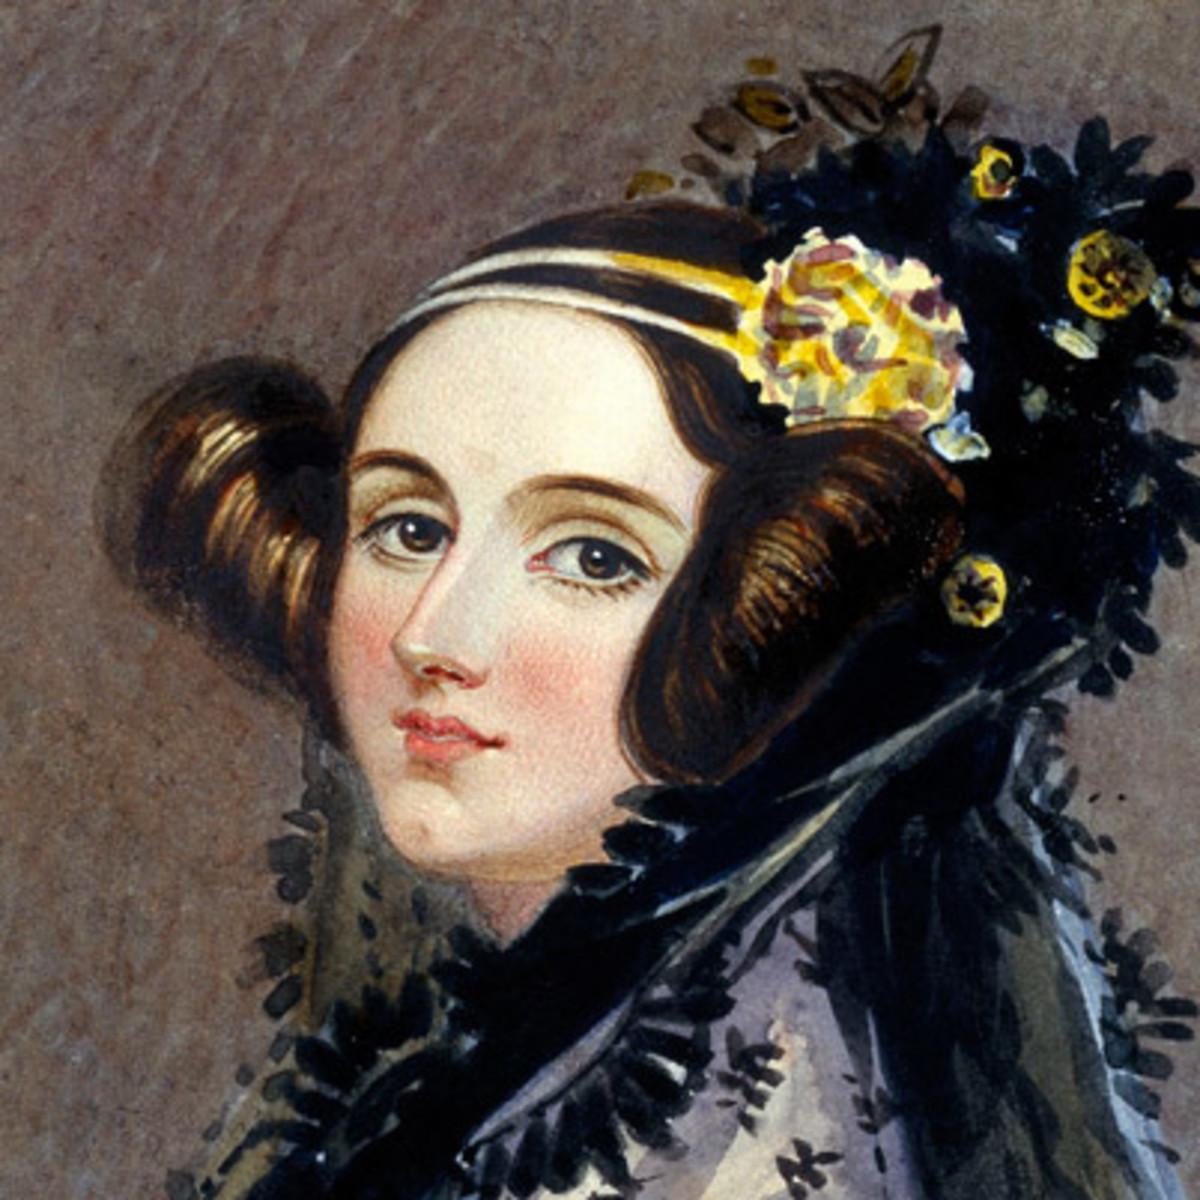 Ada Lovelace - Photo credit: Biography.com